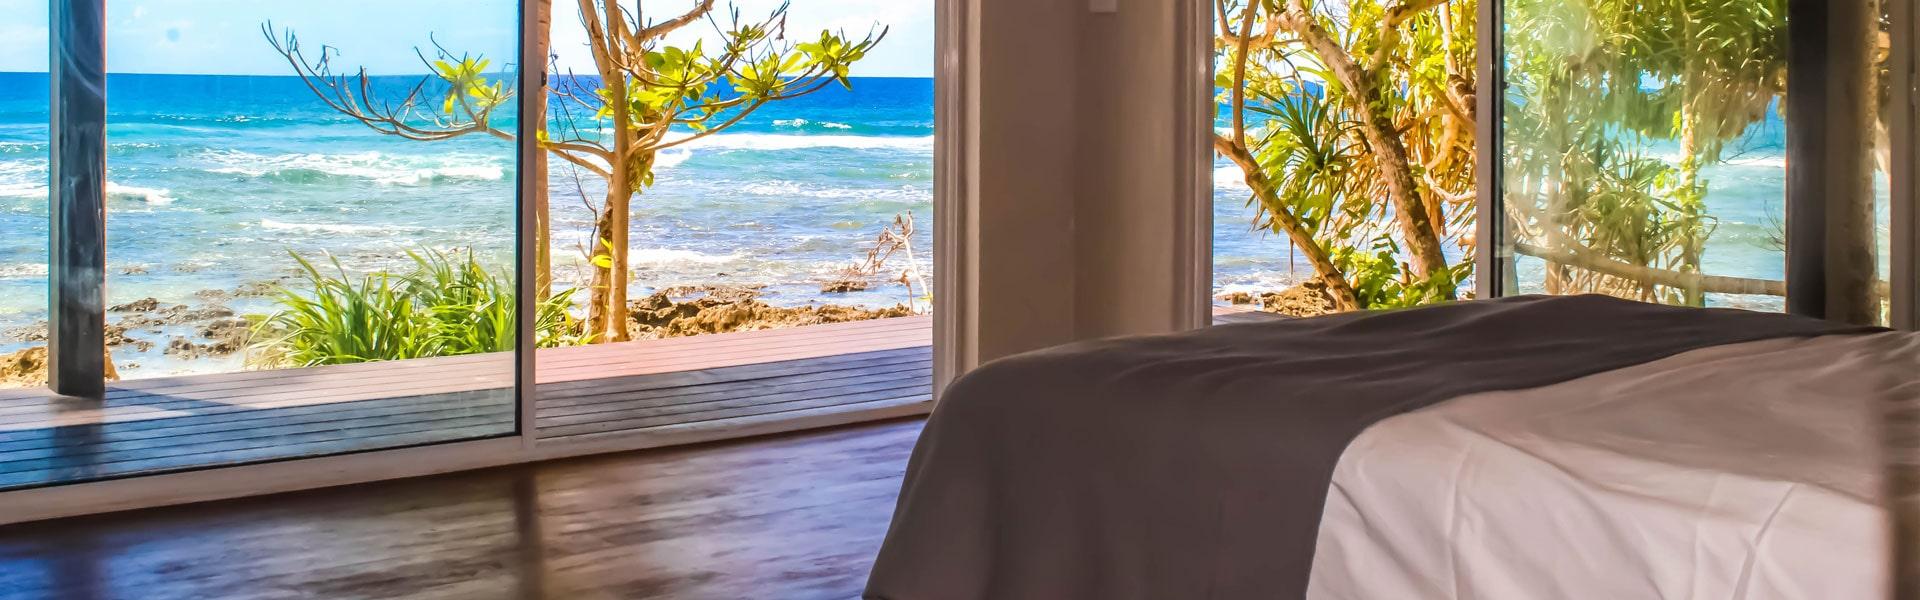 Dany-Island-April-2019-Bedroom-View